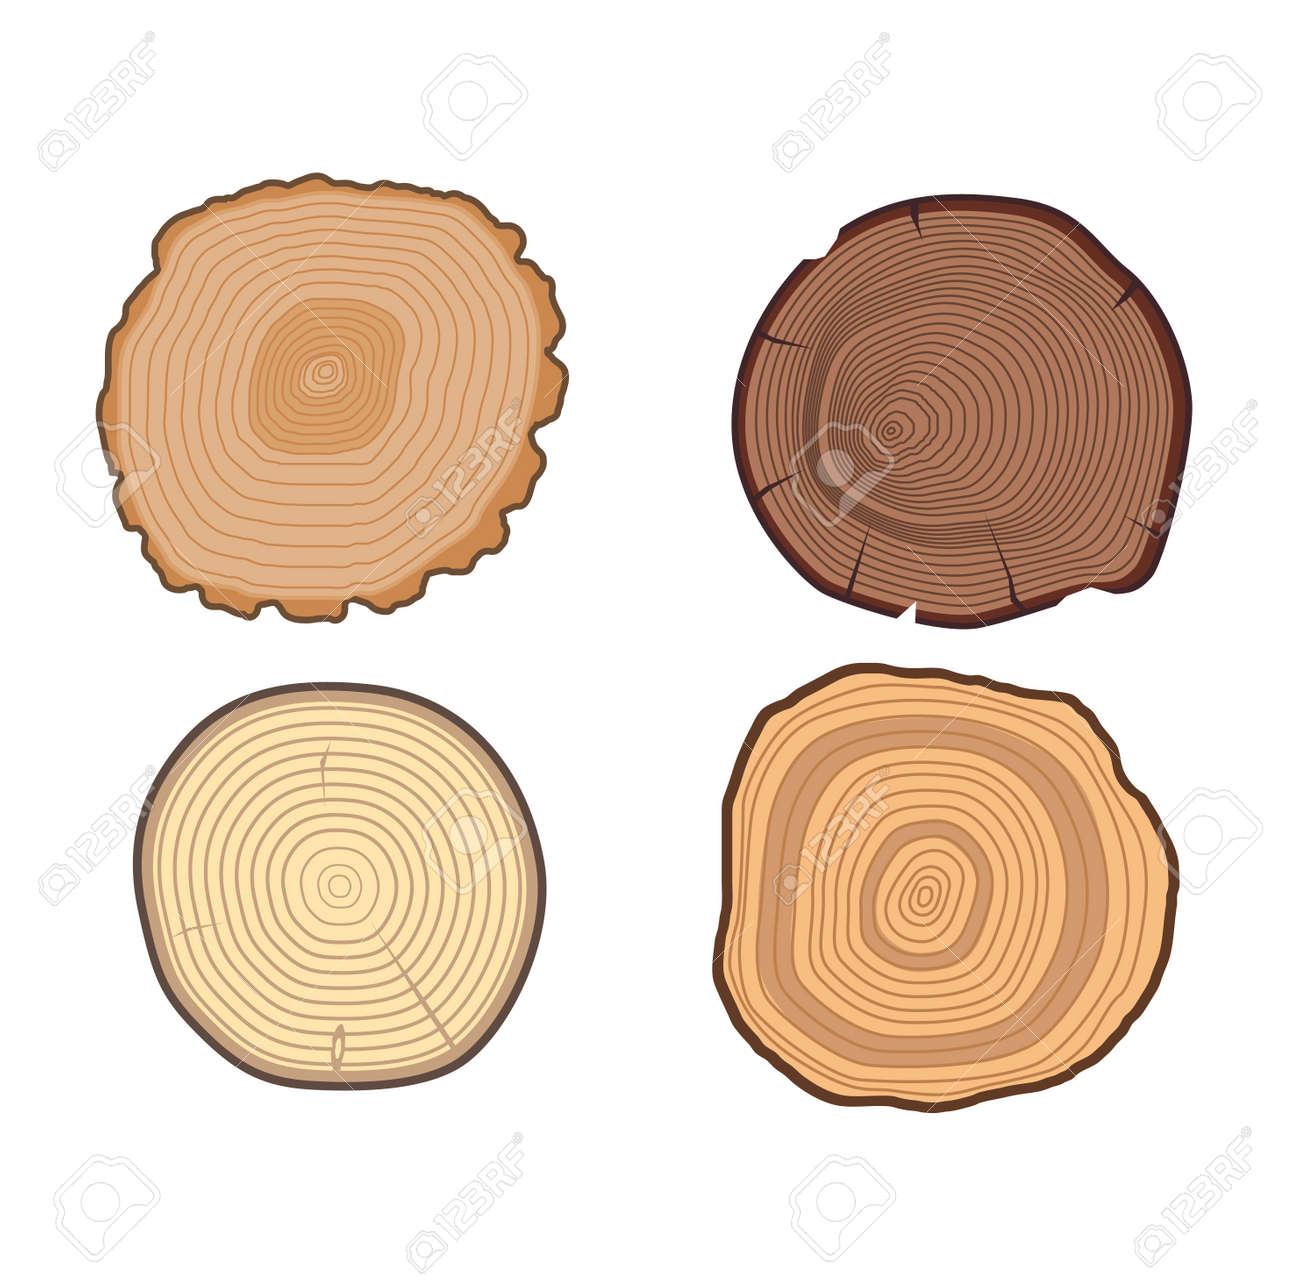 wood slice texture wooden circle cut tree material set of tree rh 123rf com wood texture vector free download wood texture vector free download ai